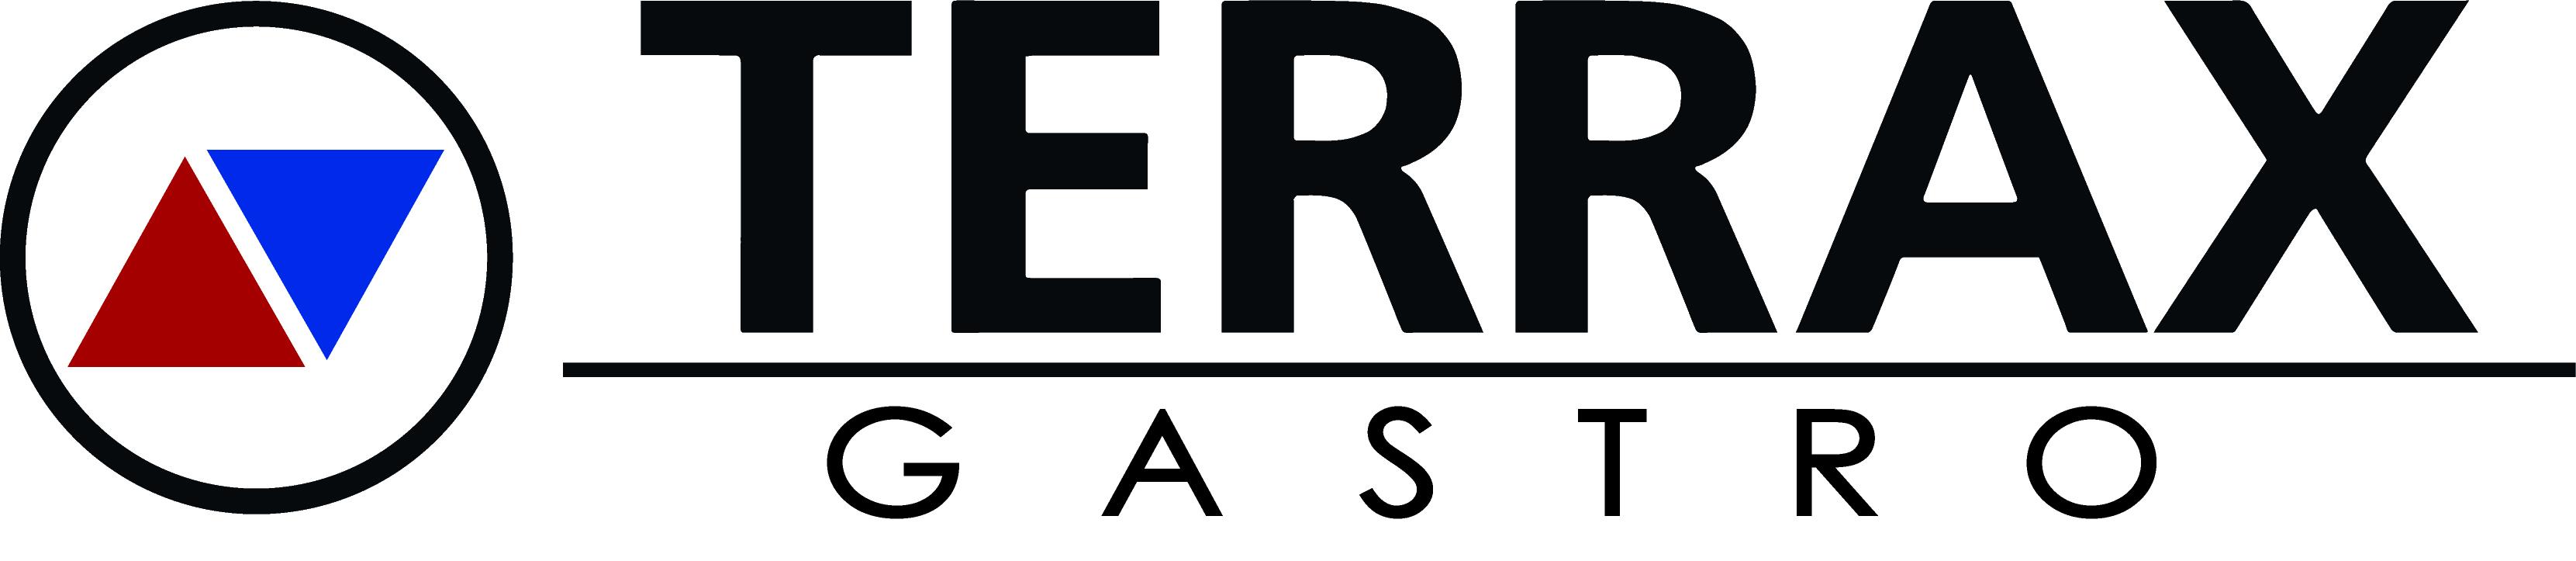 Terrax Gastro